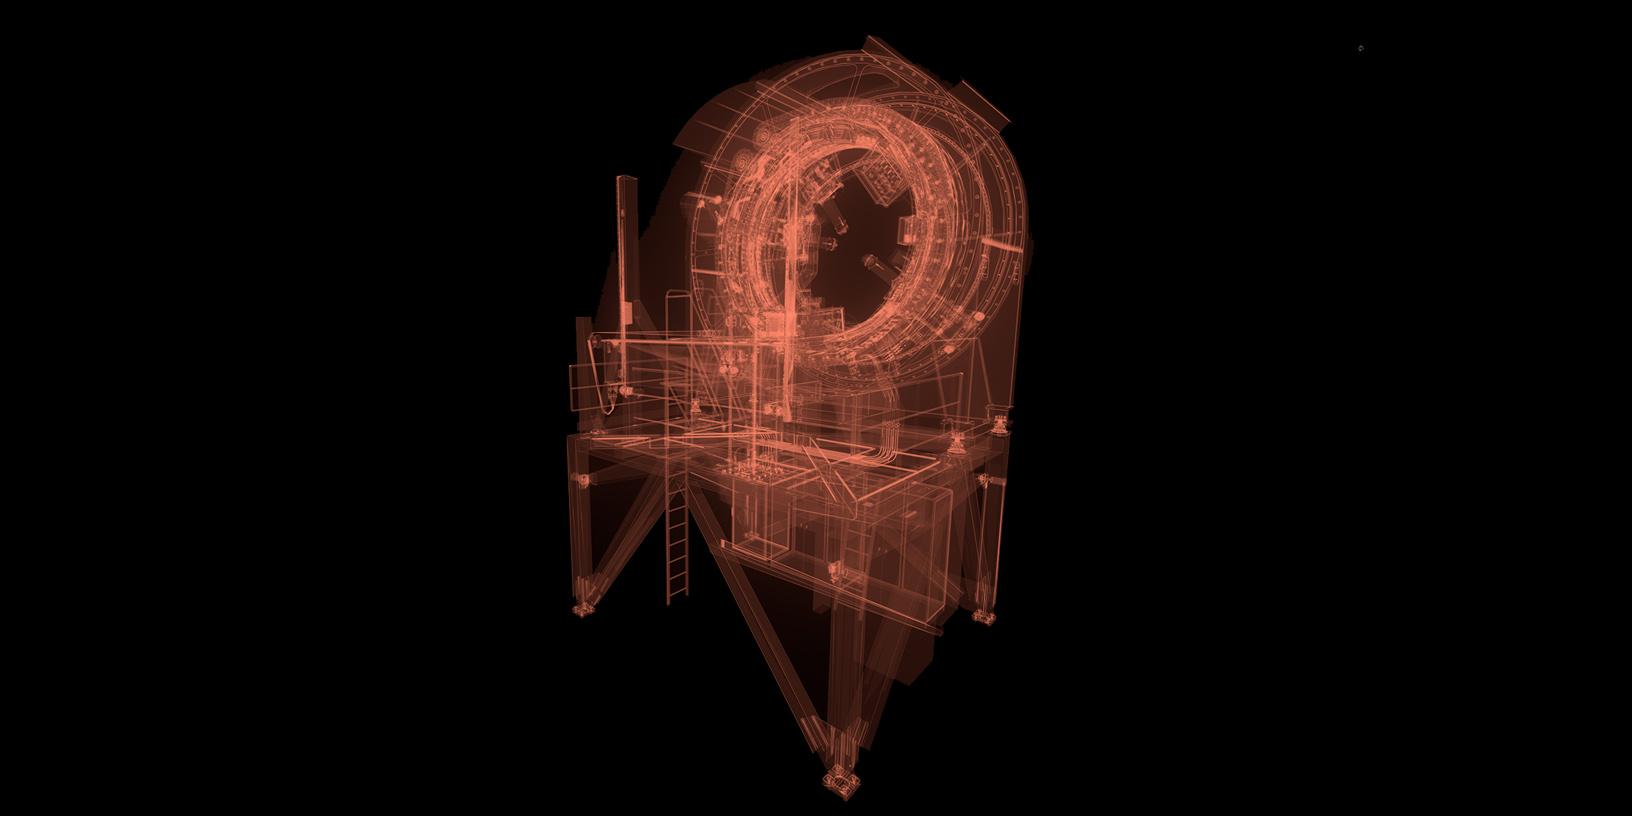 Prefocal_Stations_ELT_Extremely_Large_Telescope_Chile_IDOM (2)